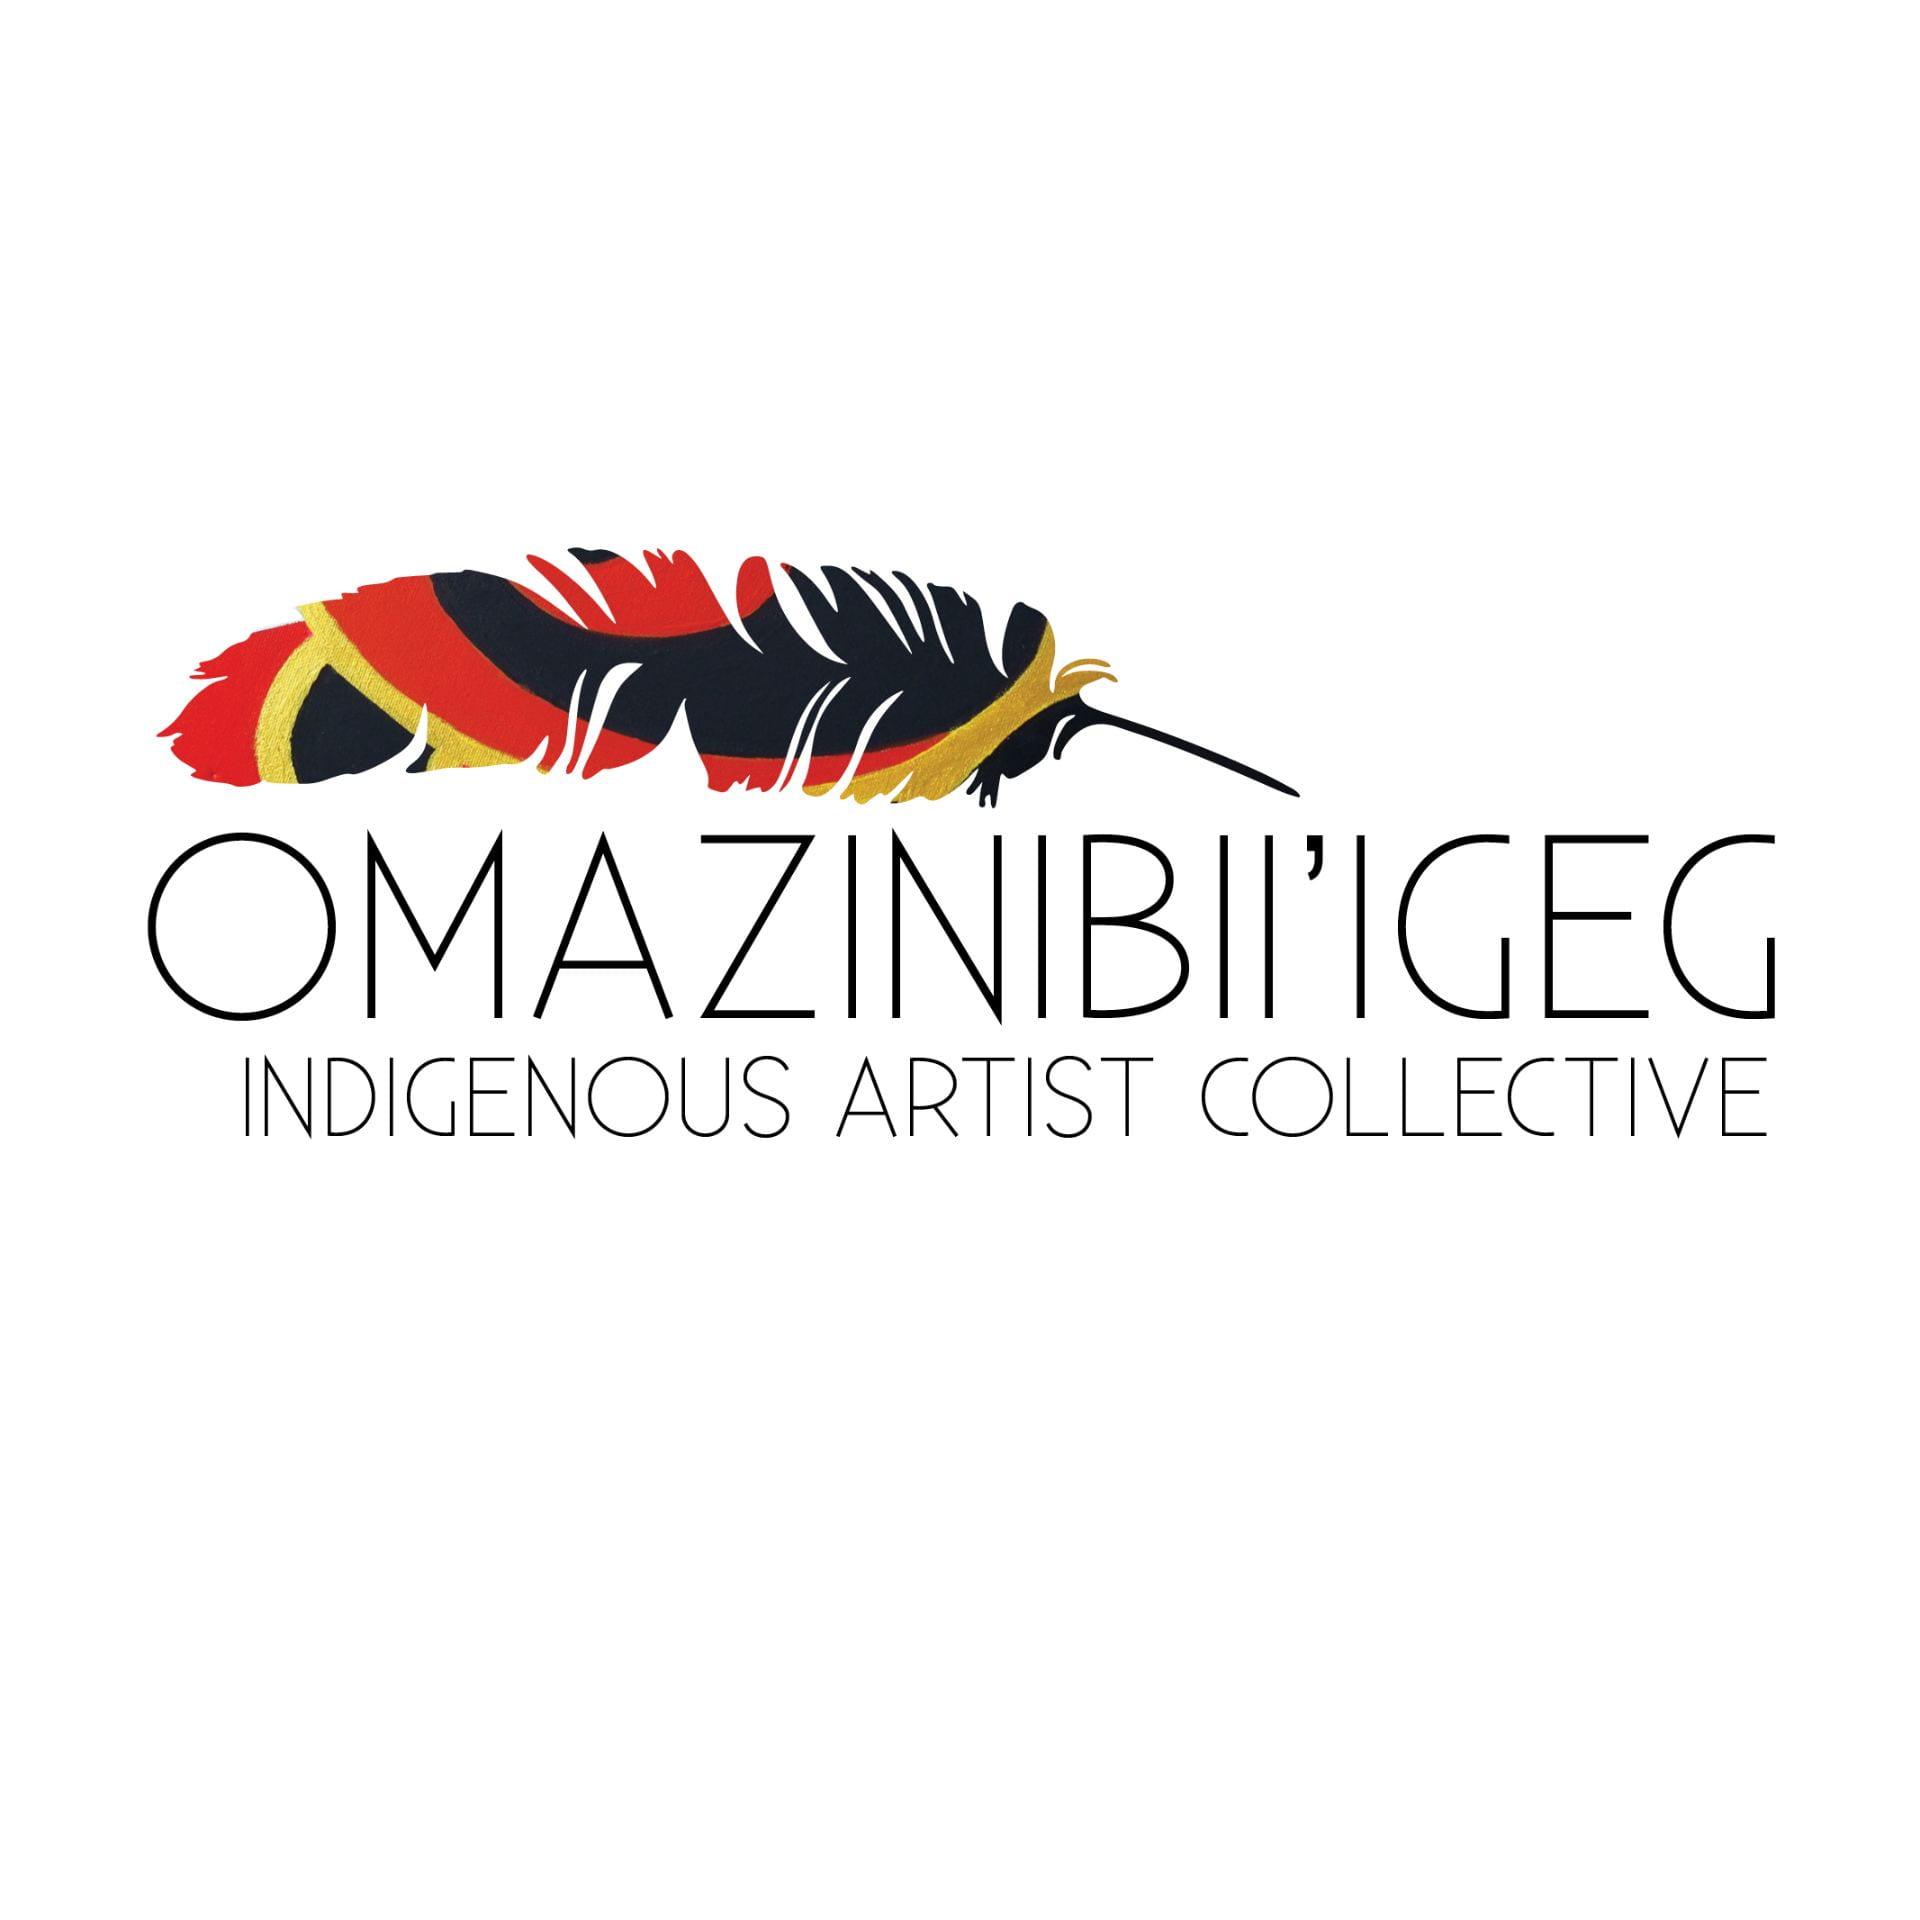 Omazartcollective